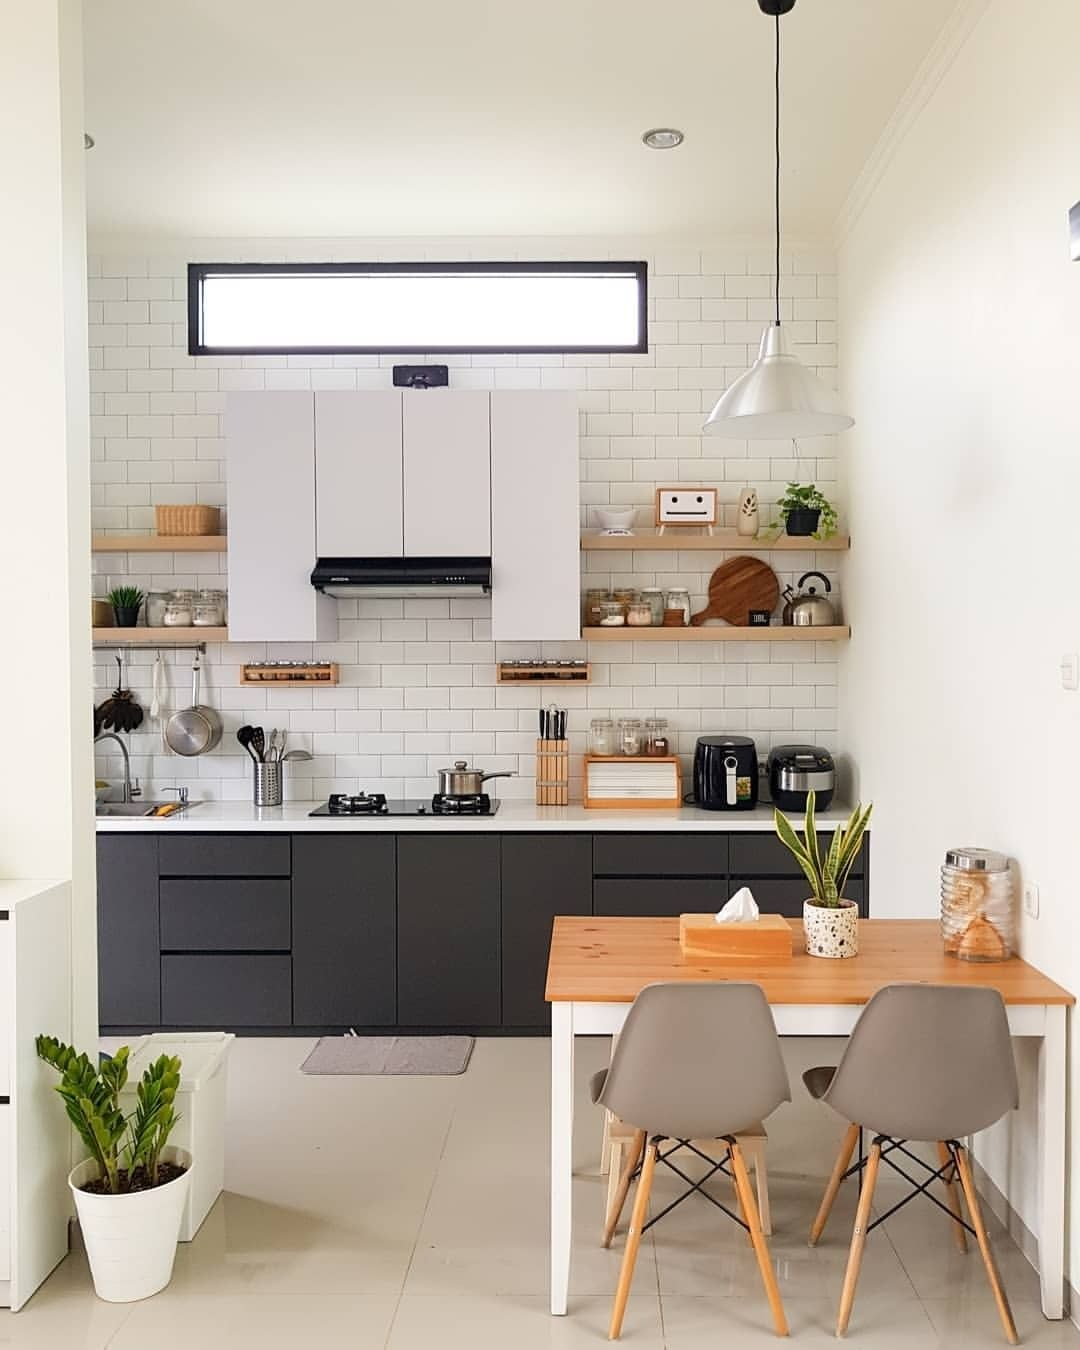 Model Kitchen Set Minimalis Dapur Kecil Sederhana Namun Modern